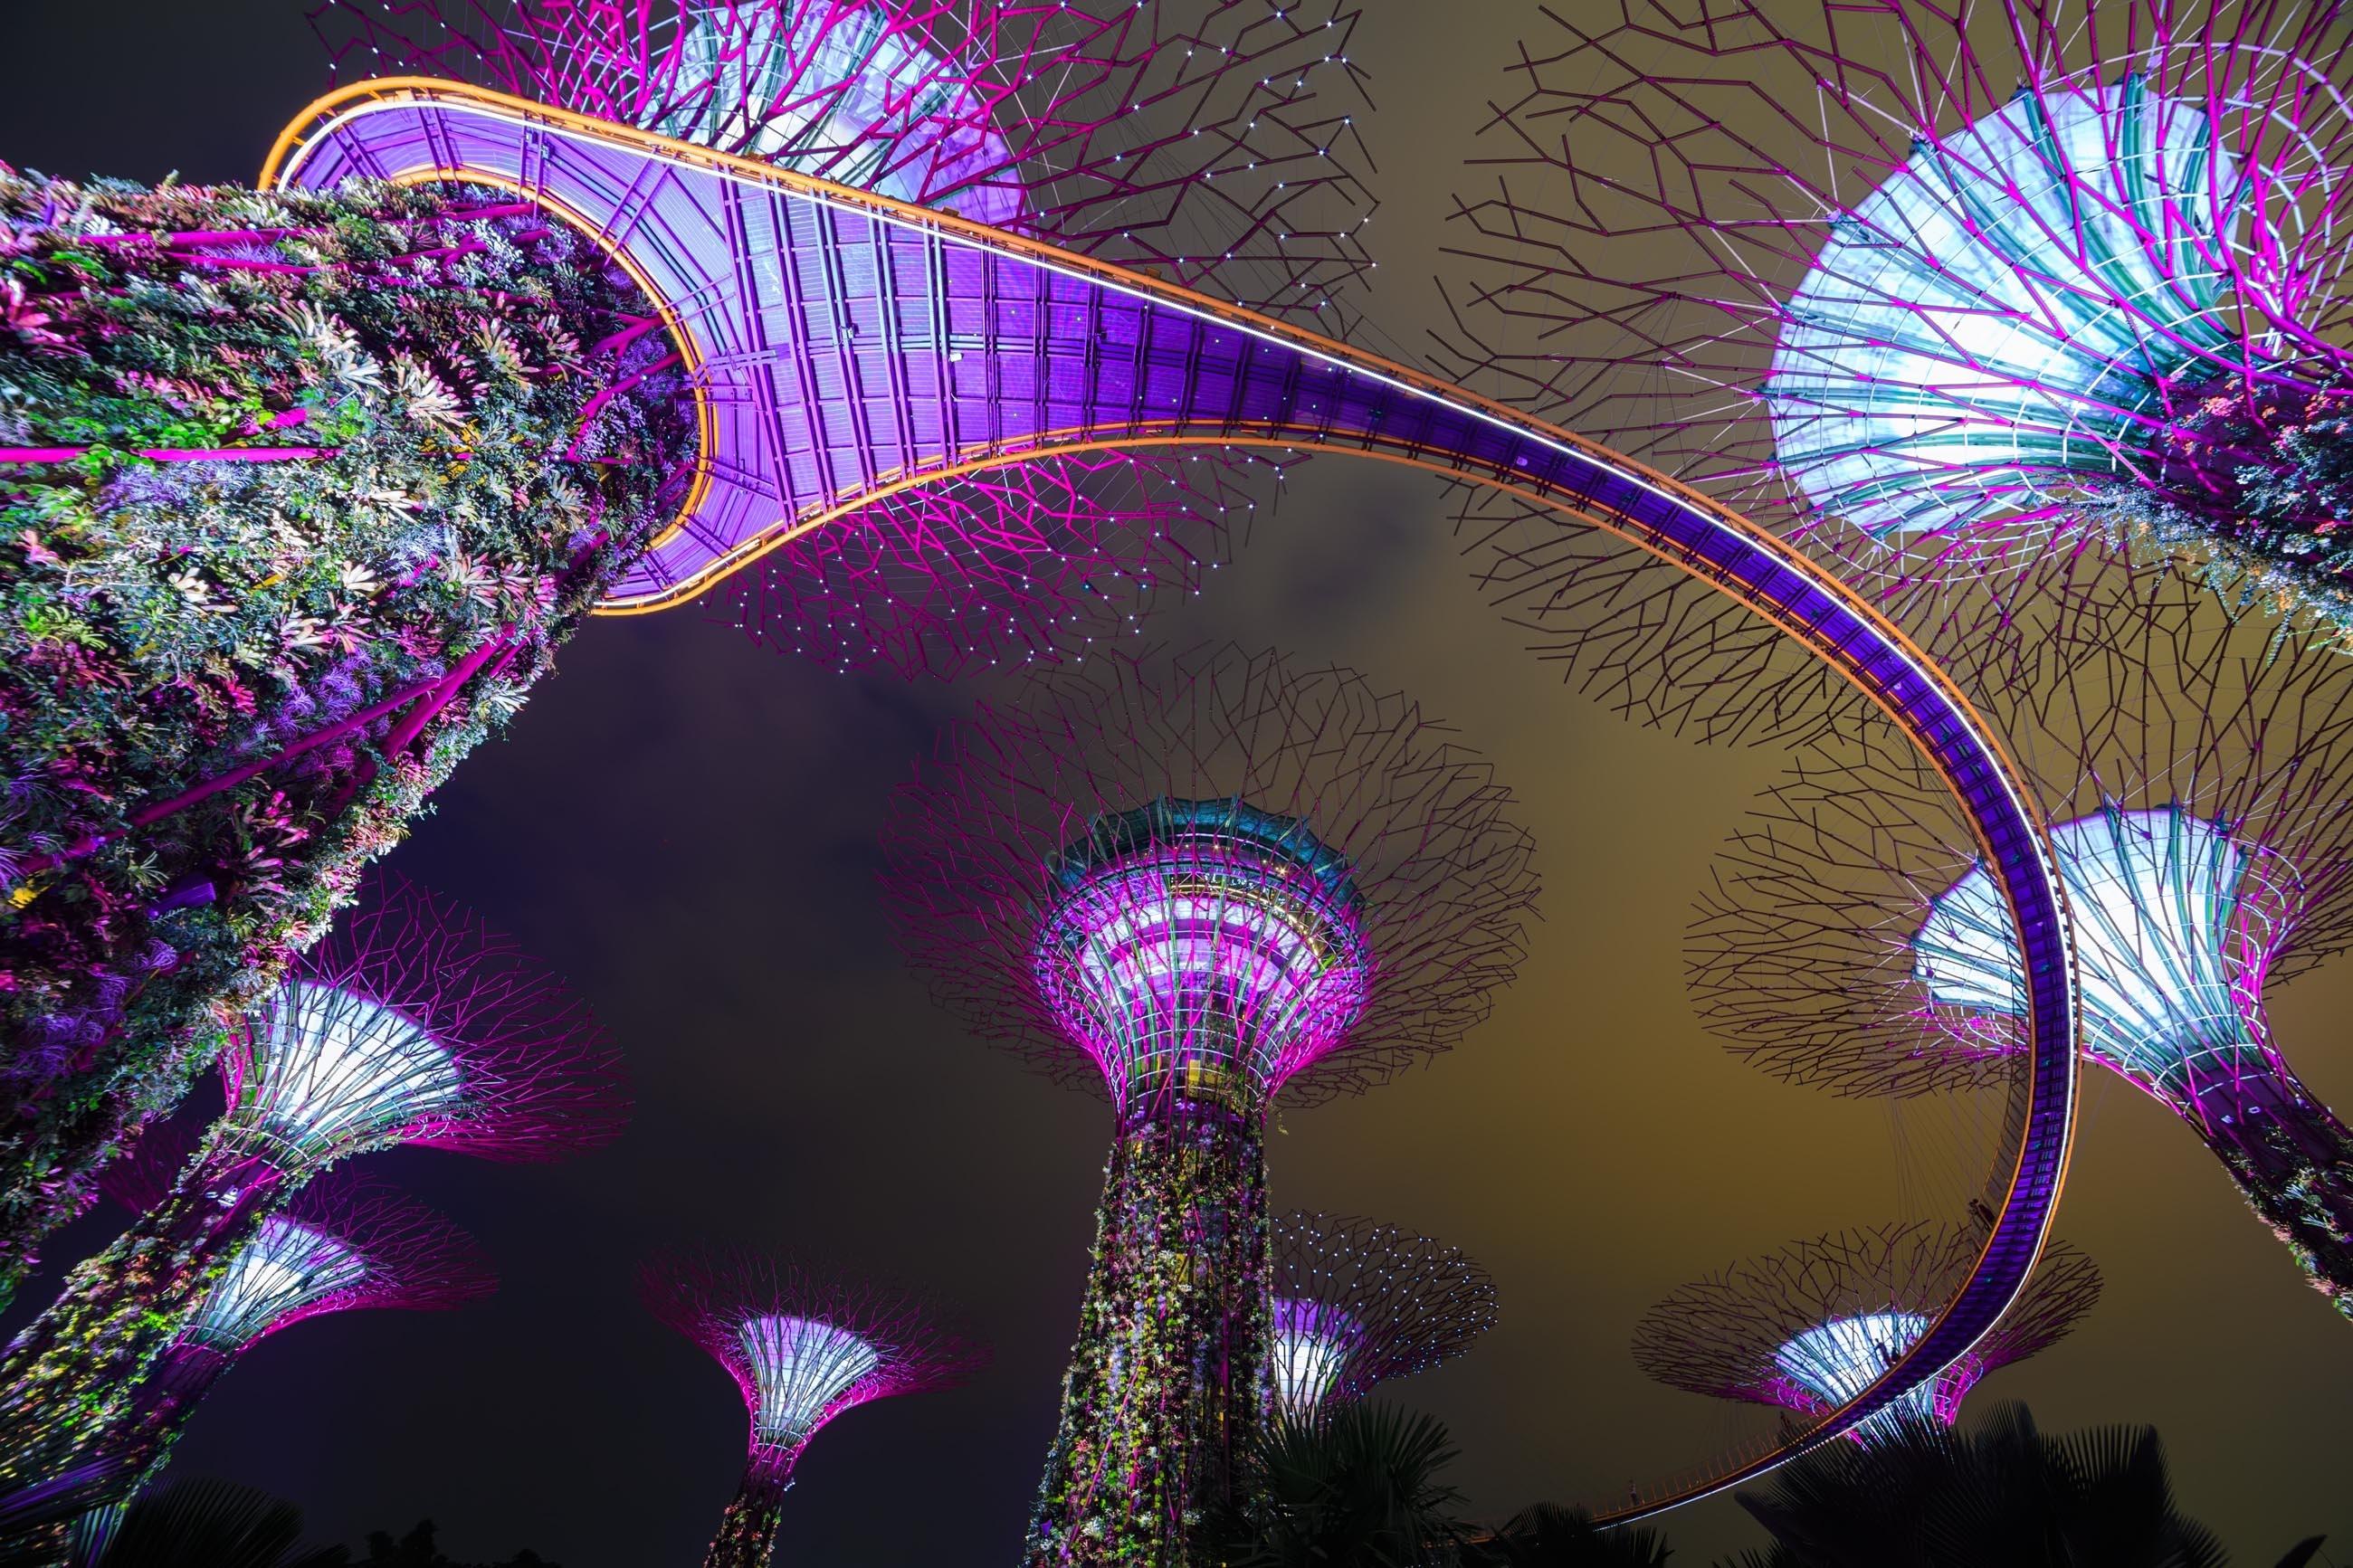 Du lich tu tuc Singapore va tat ca kinh nghiem phai biet hinh anh 15